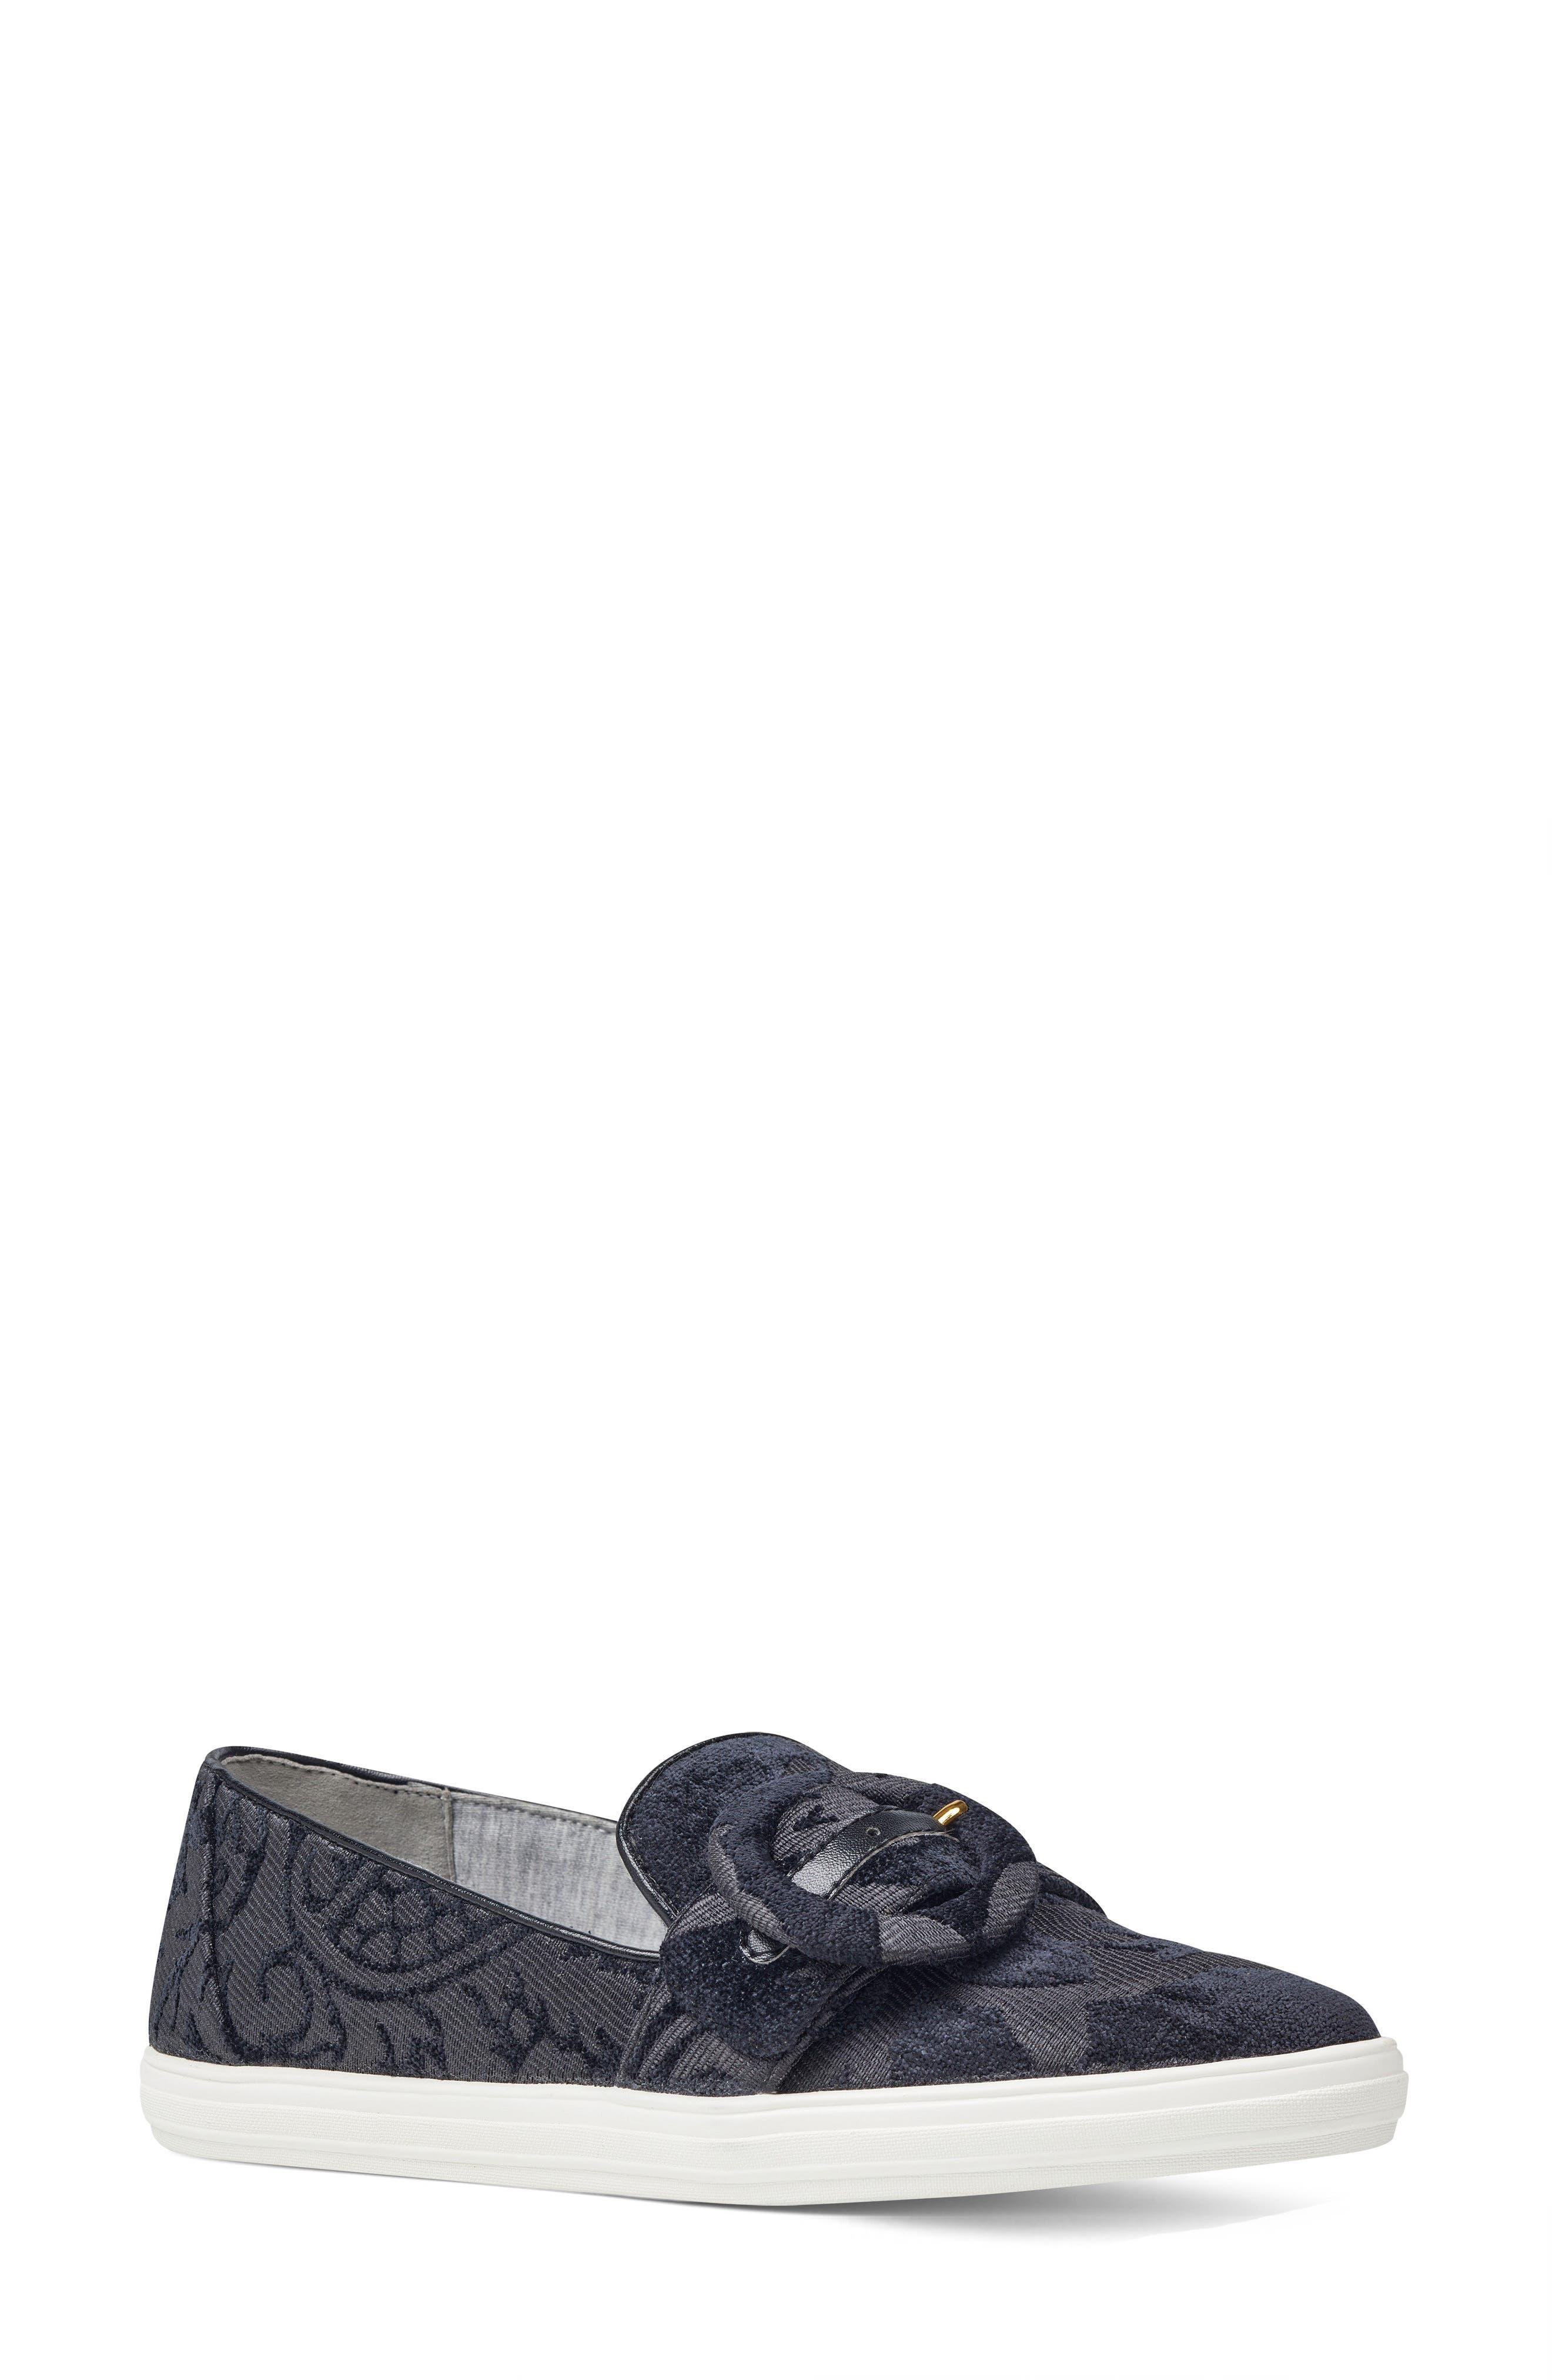 Main Image - Nine West Shireene Slip-On Sneaker (Women)